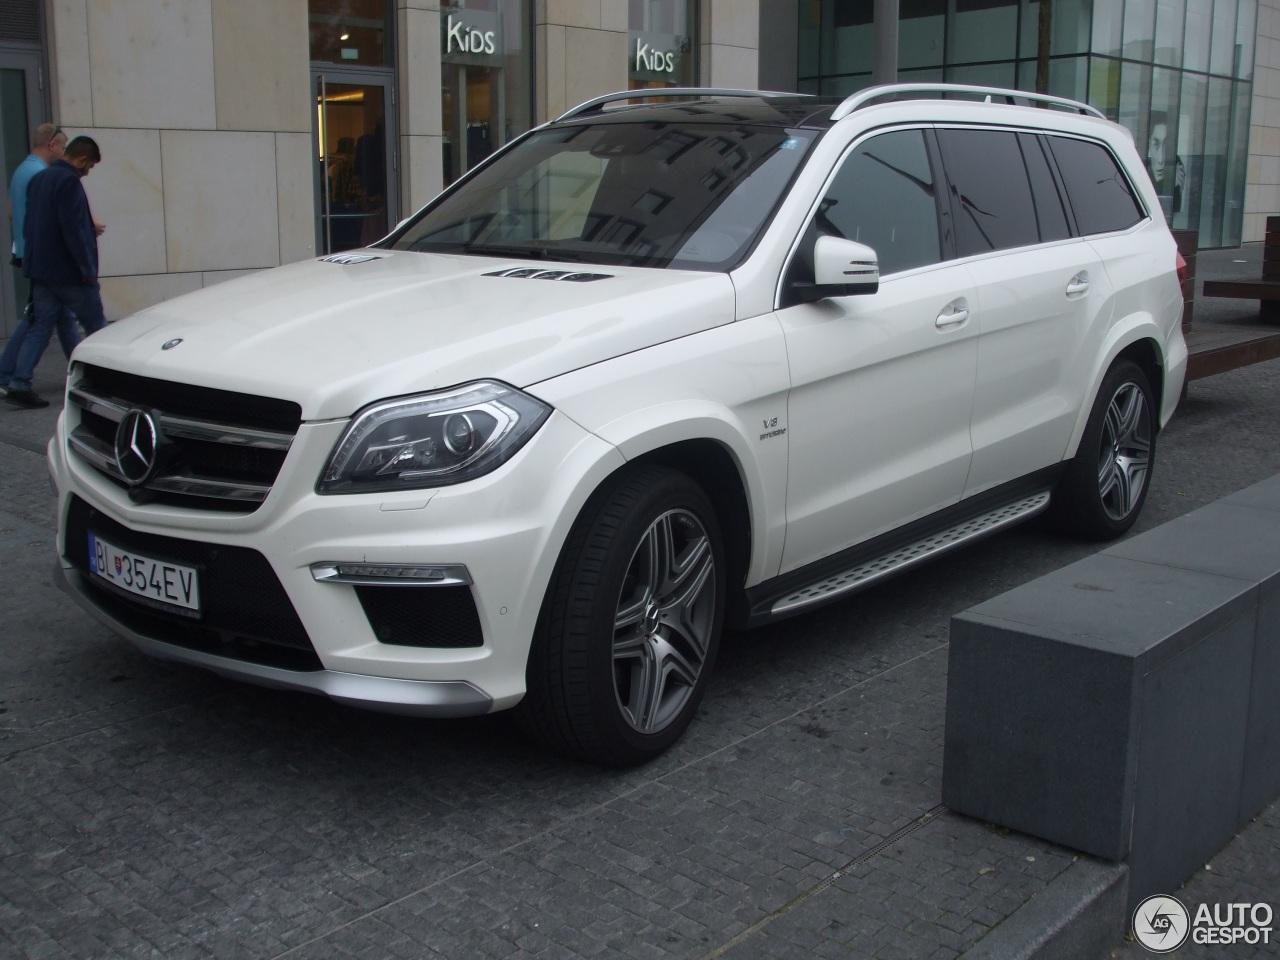 Mercedes benz gl 63 amg x166 7 october 2015 autogespot for Mercedes benz gl 2015